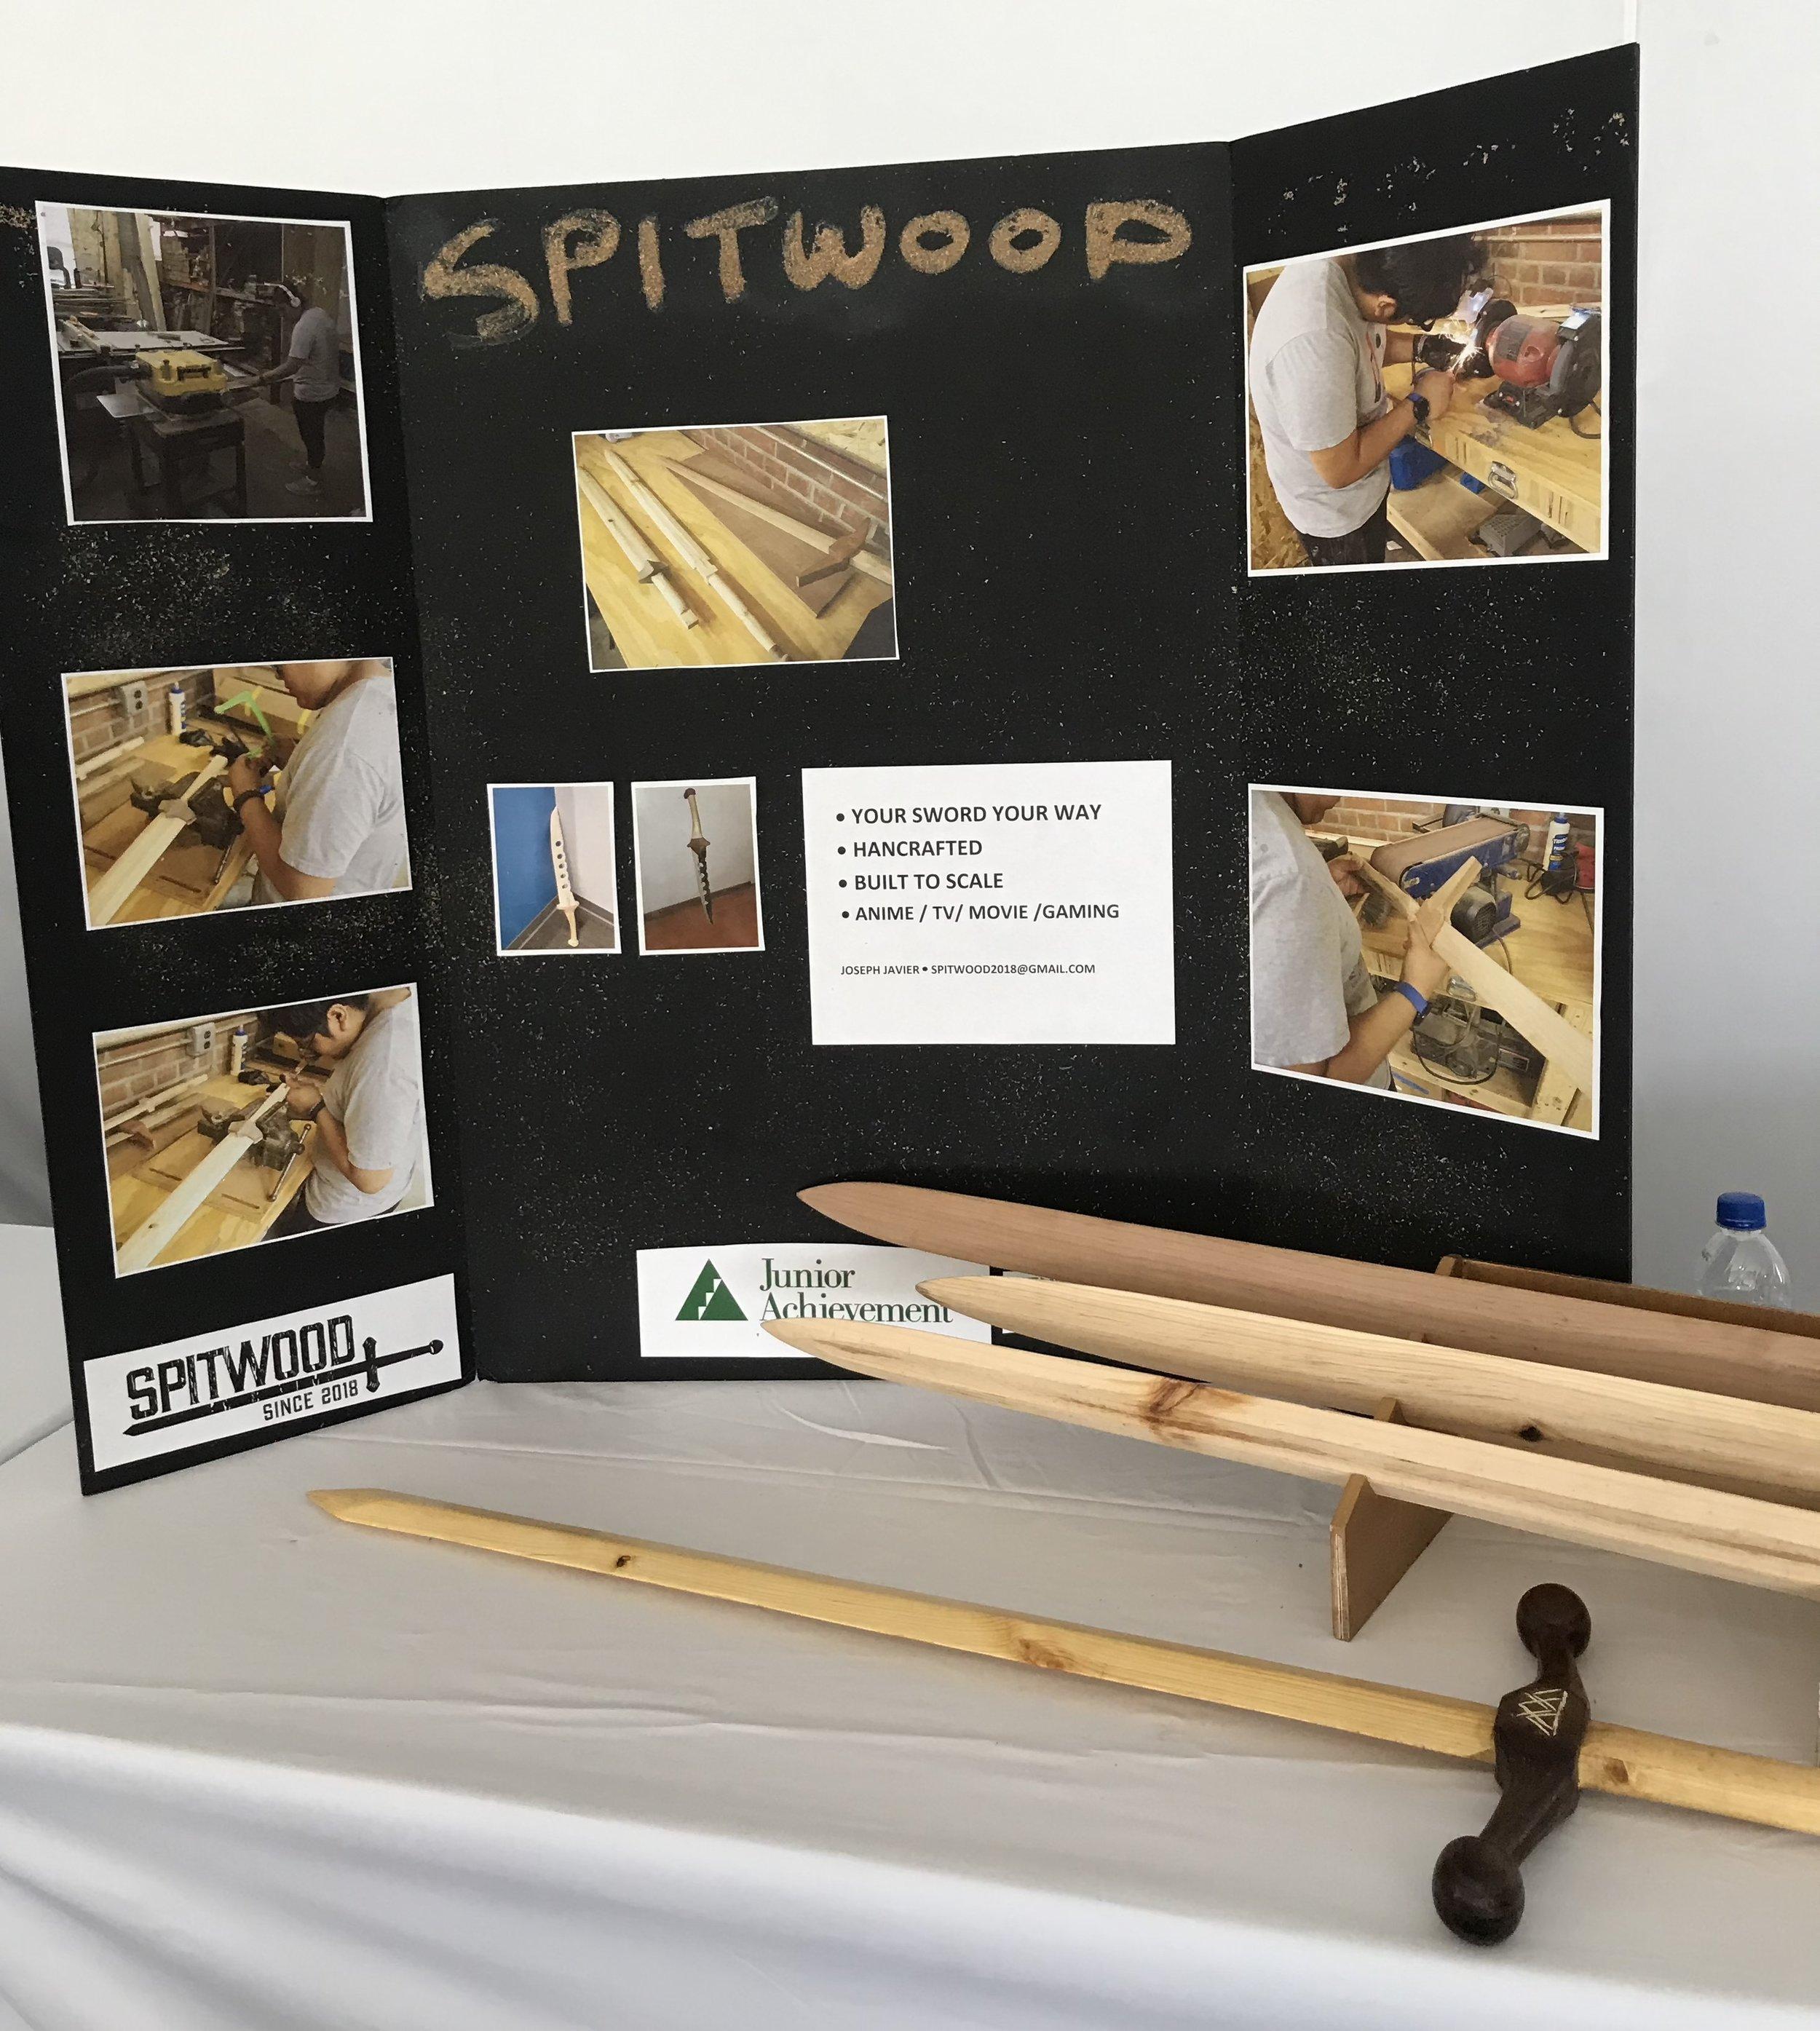 Spitwood copy.jpg